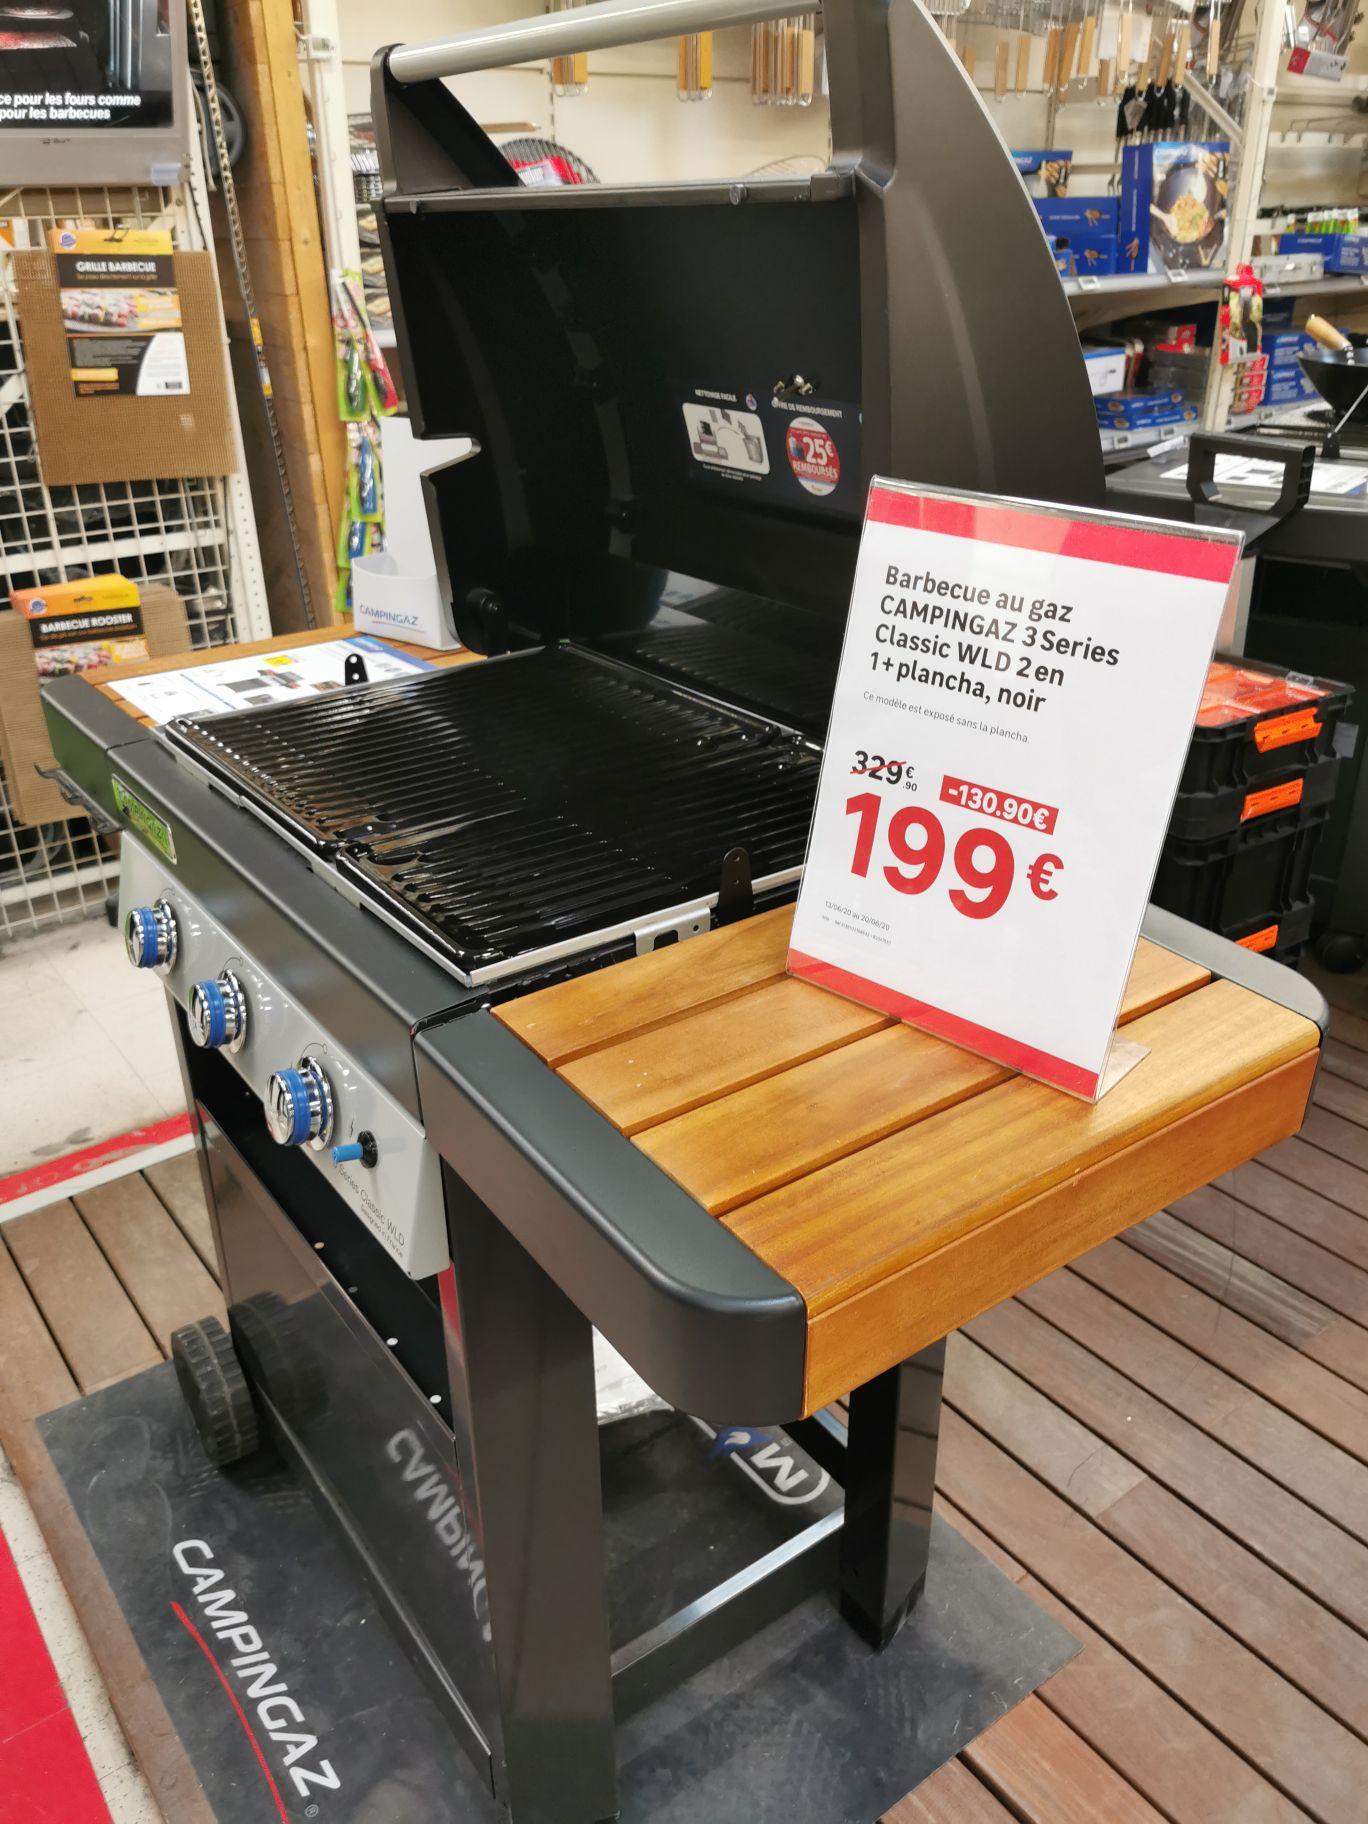 Barbecue à gaz Campingaz 3series Classic WLD - Leroy Merlin Nice Lingostiere (06)